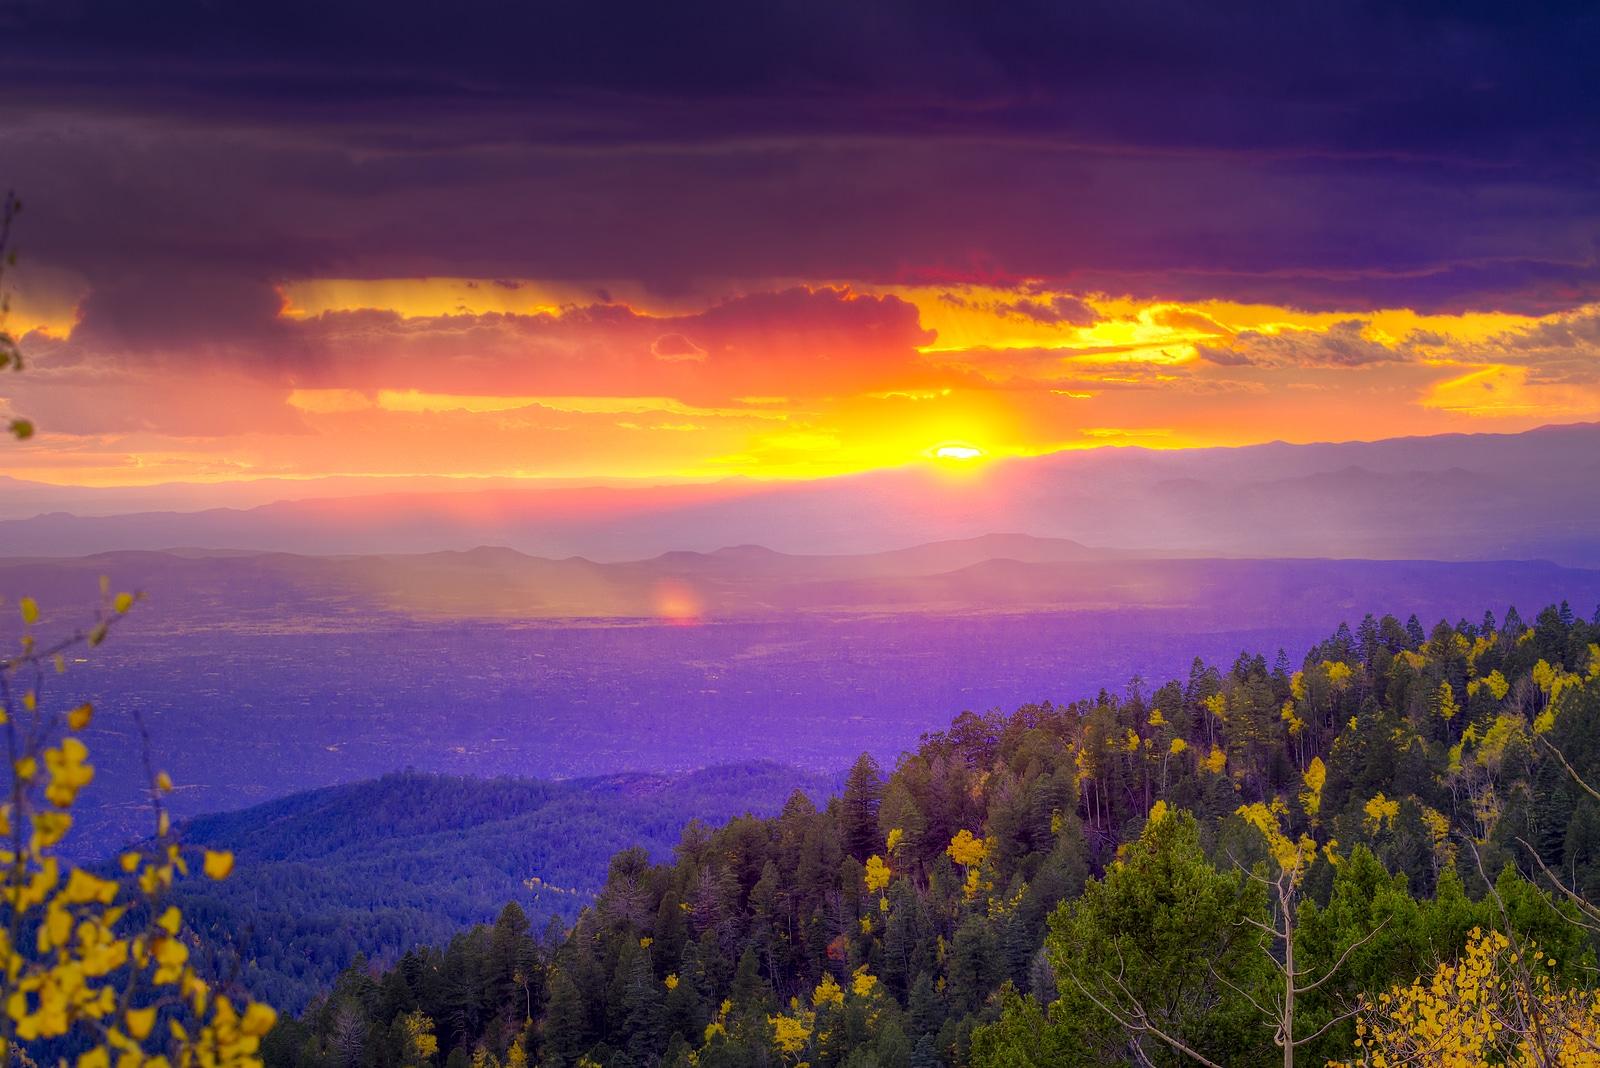 Santa Fe Mountain Biking Trails